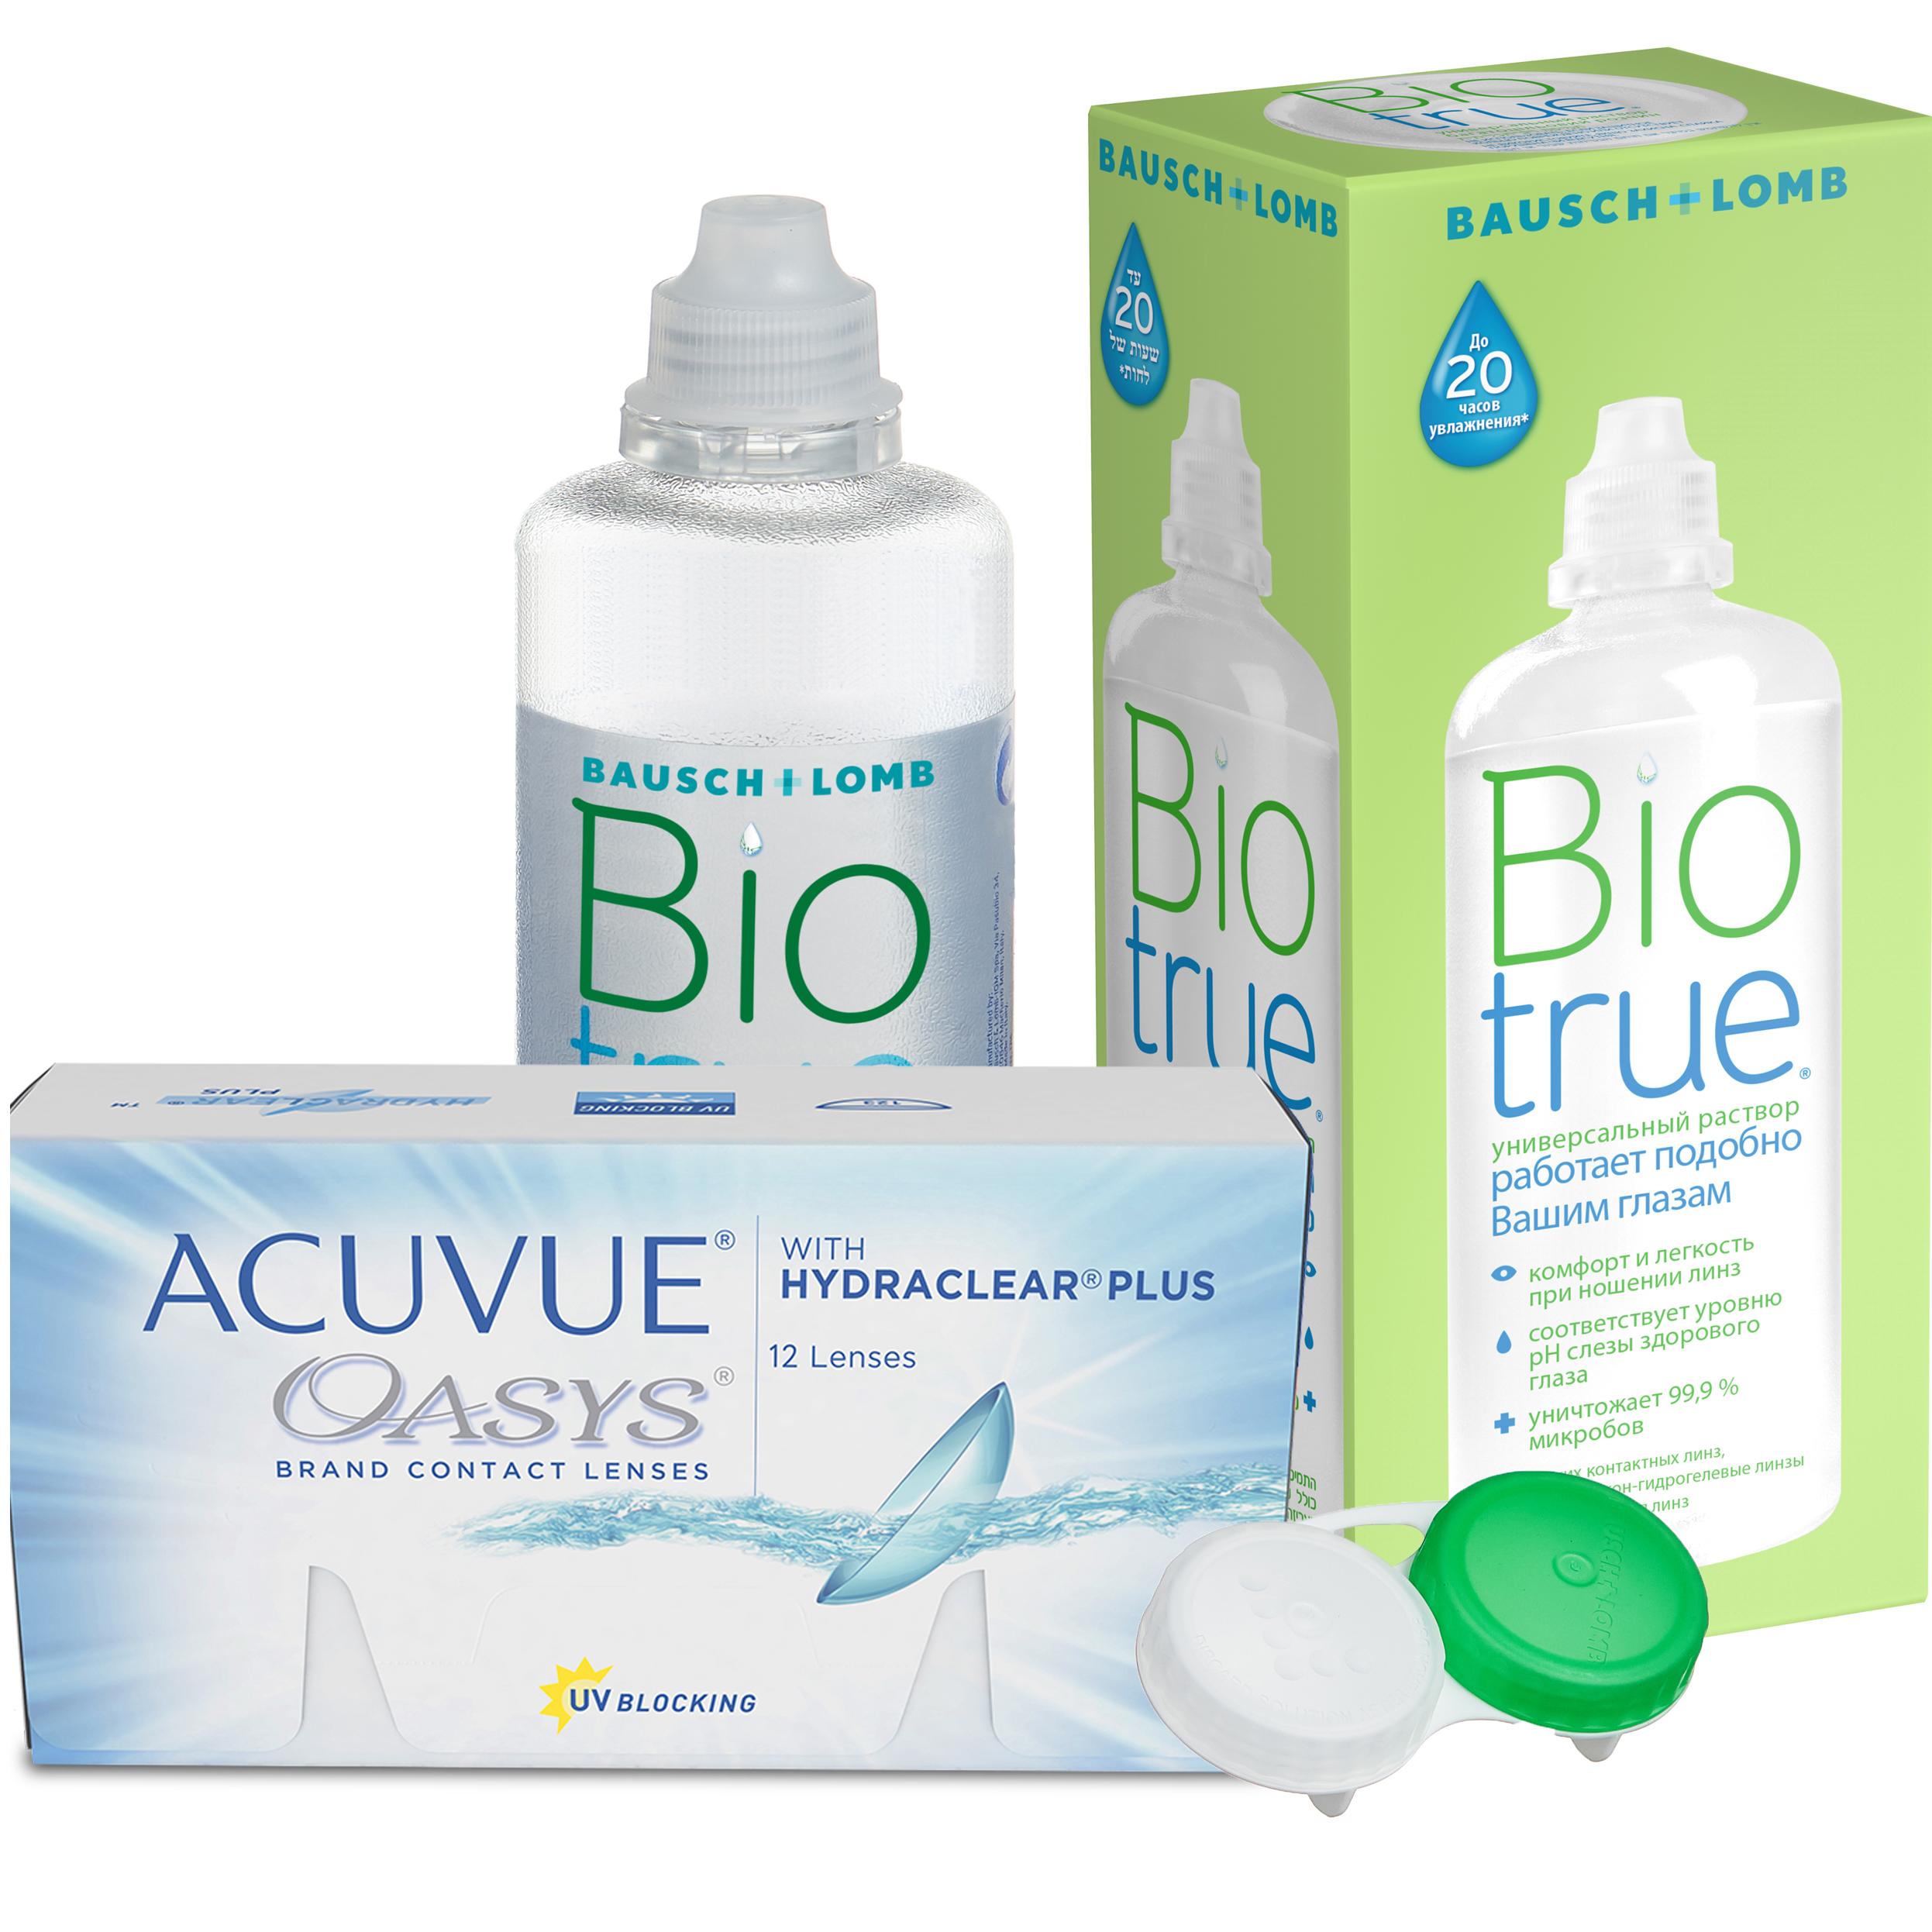 Купить Oasys with Hydraclear Plus 12 линз + Biotrue, Контактные линзы Acuvue Oasys with Hydraclear Plus 12 линз R 8.4 -10, 50 + Biotrue 300 мл